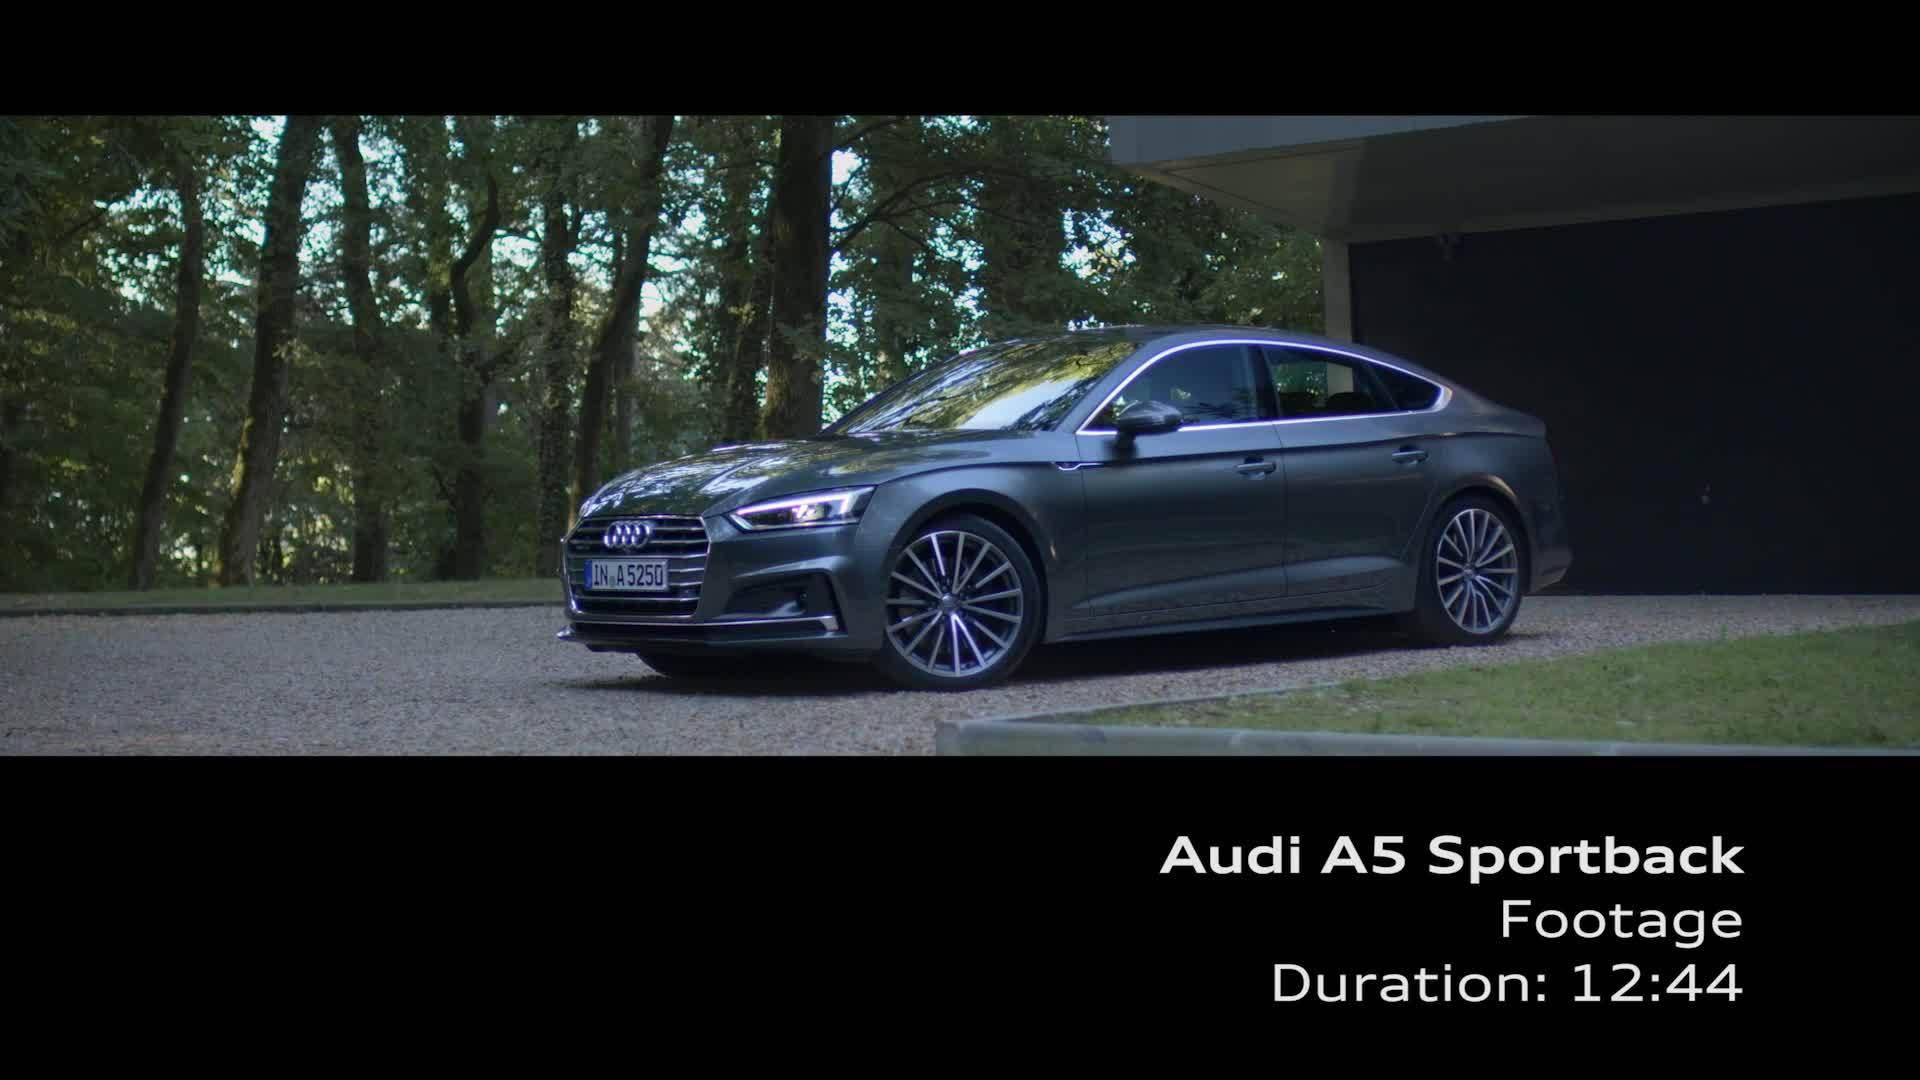 audi a5 sportback footage [ 1920 x 1080 Pixel ]